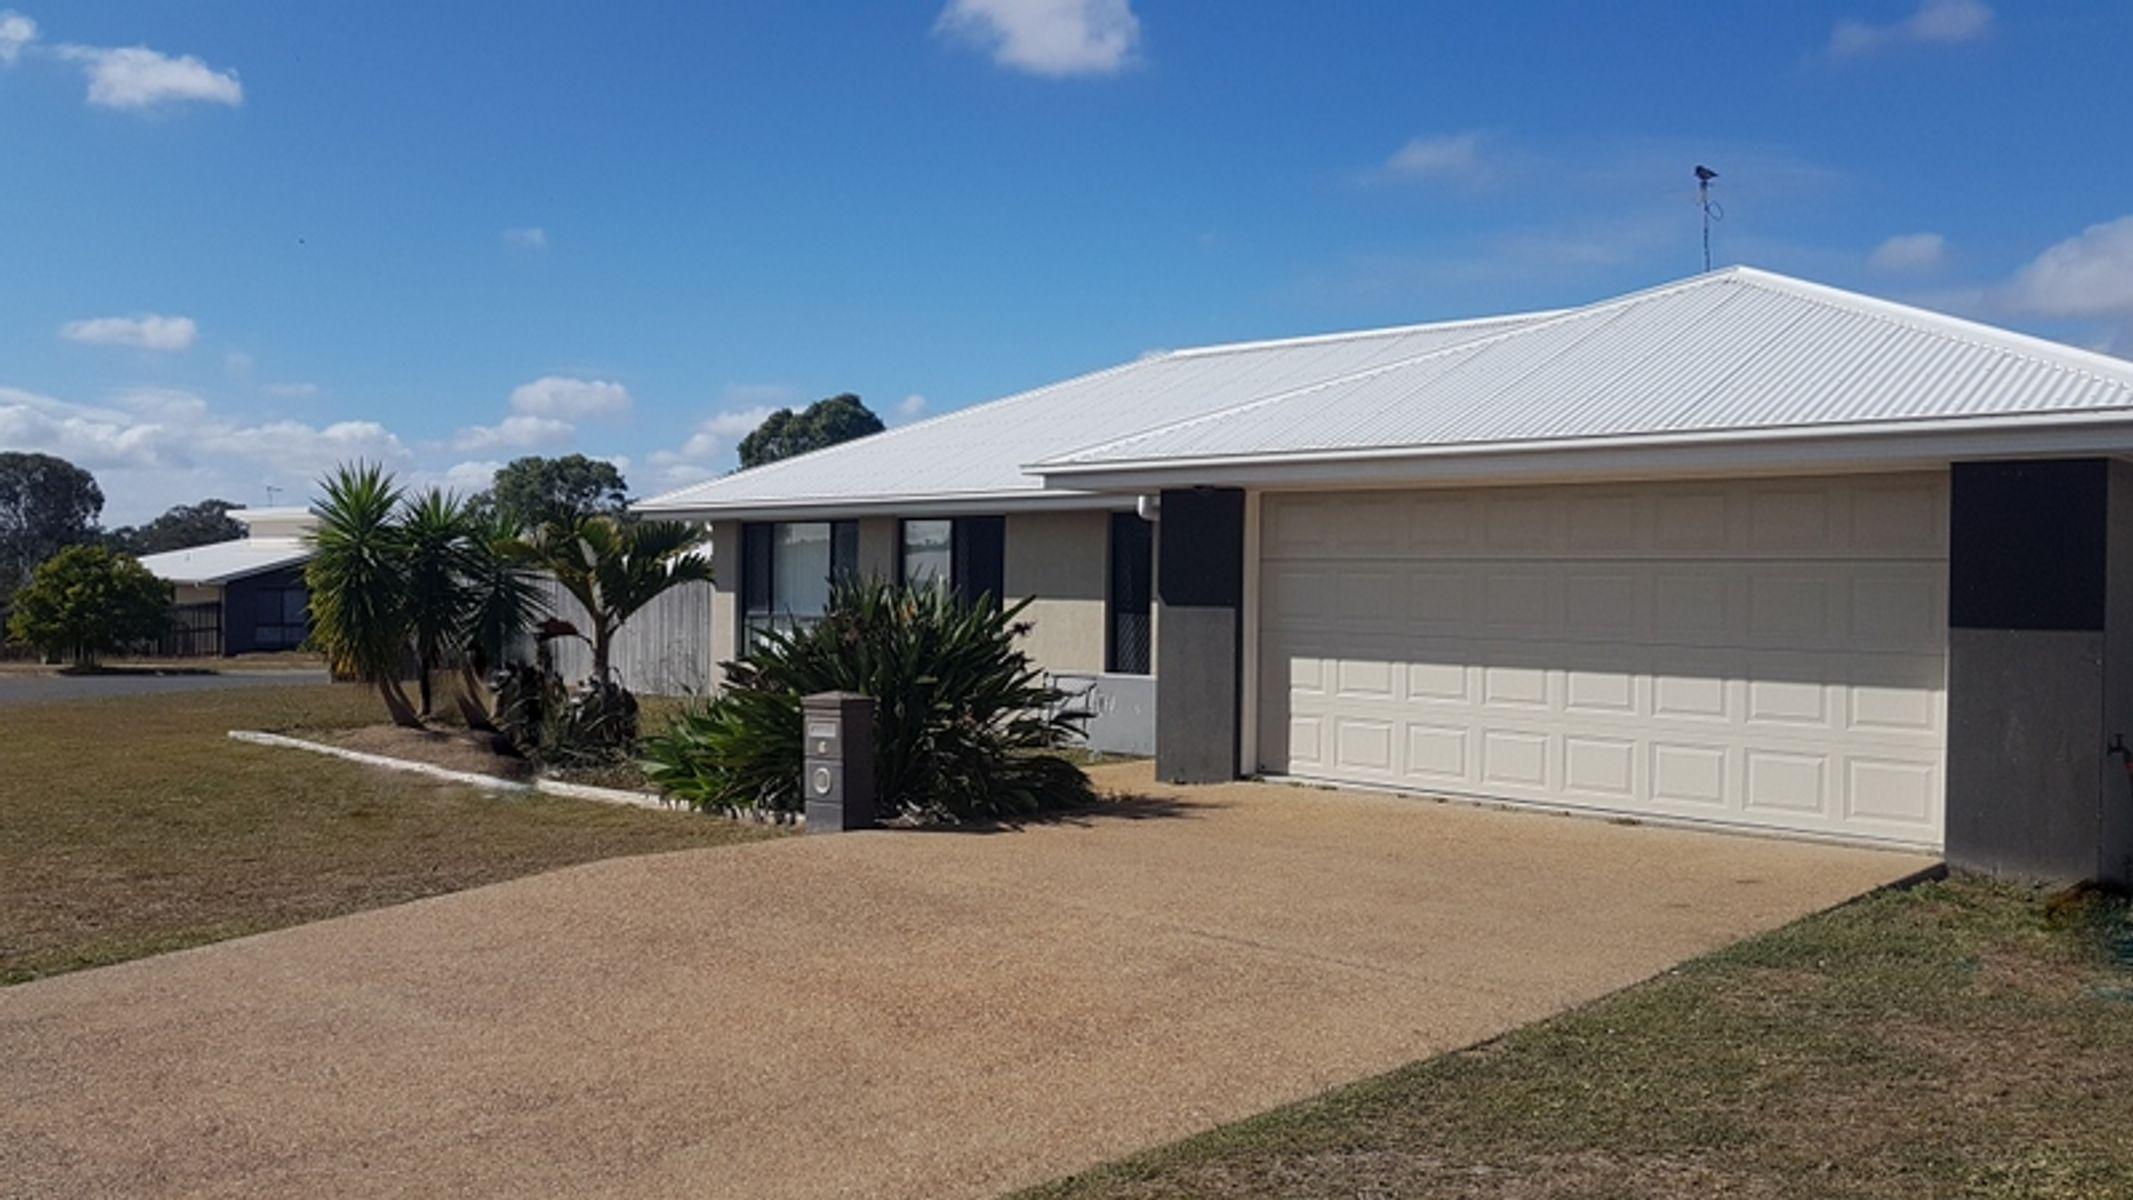 18 Sylvana Avenue, Gracemere, QLD 4702